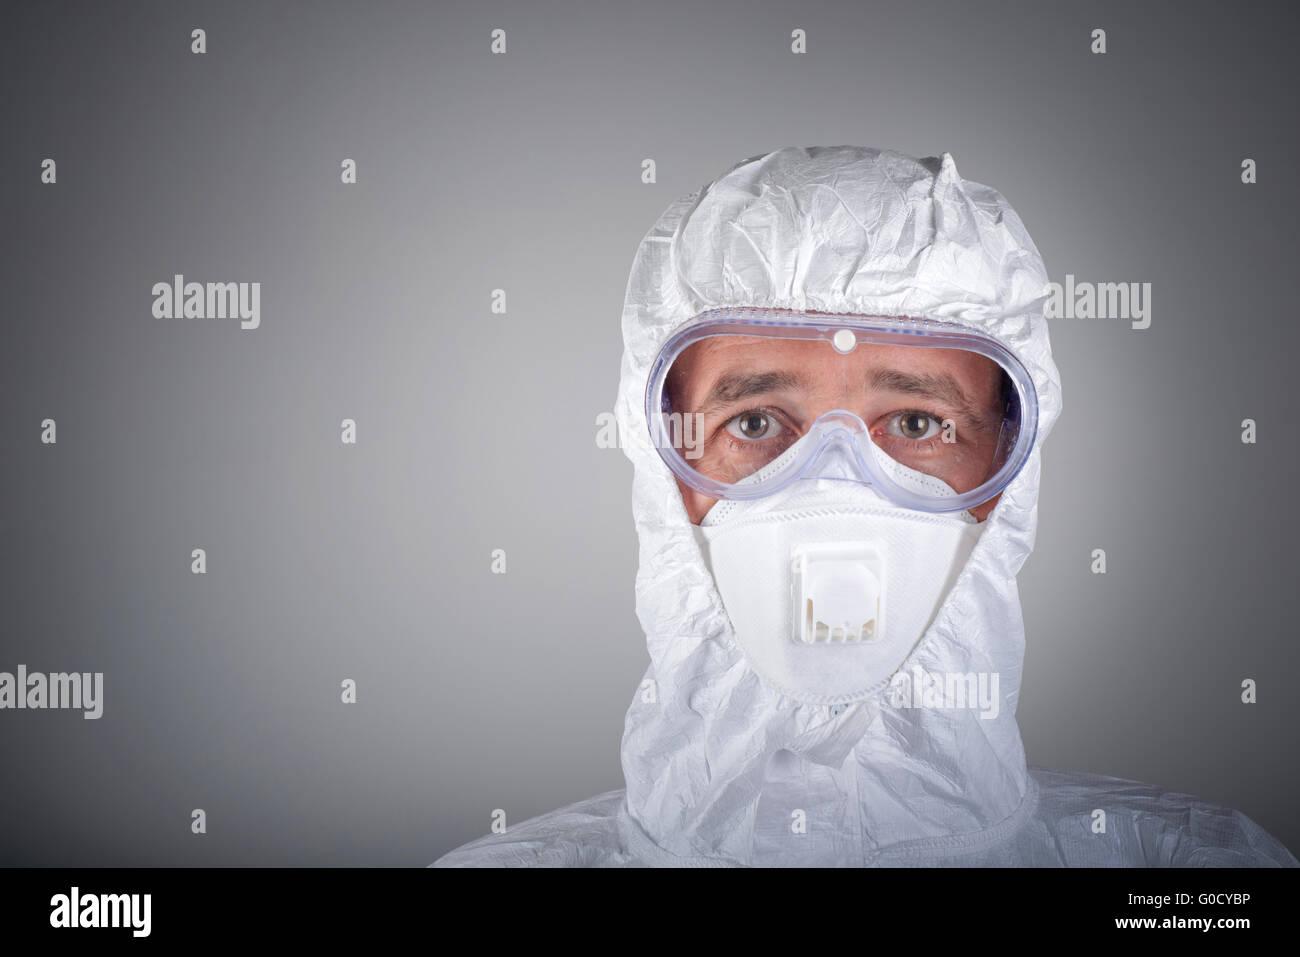 Scientist in protective wear, glasses, respirator - Stock Image